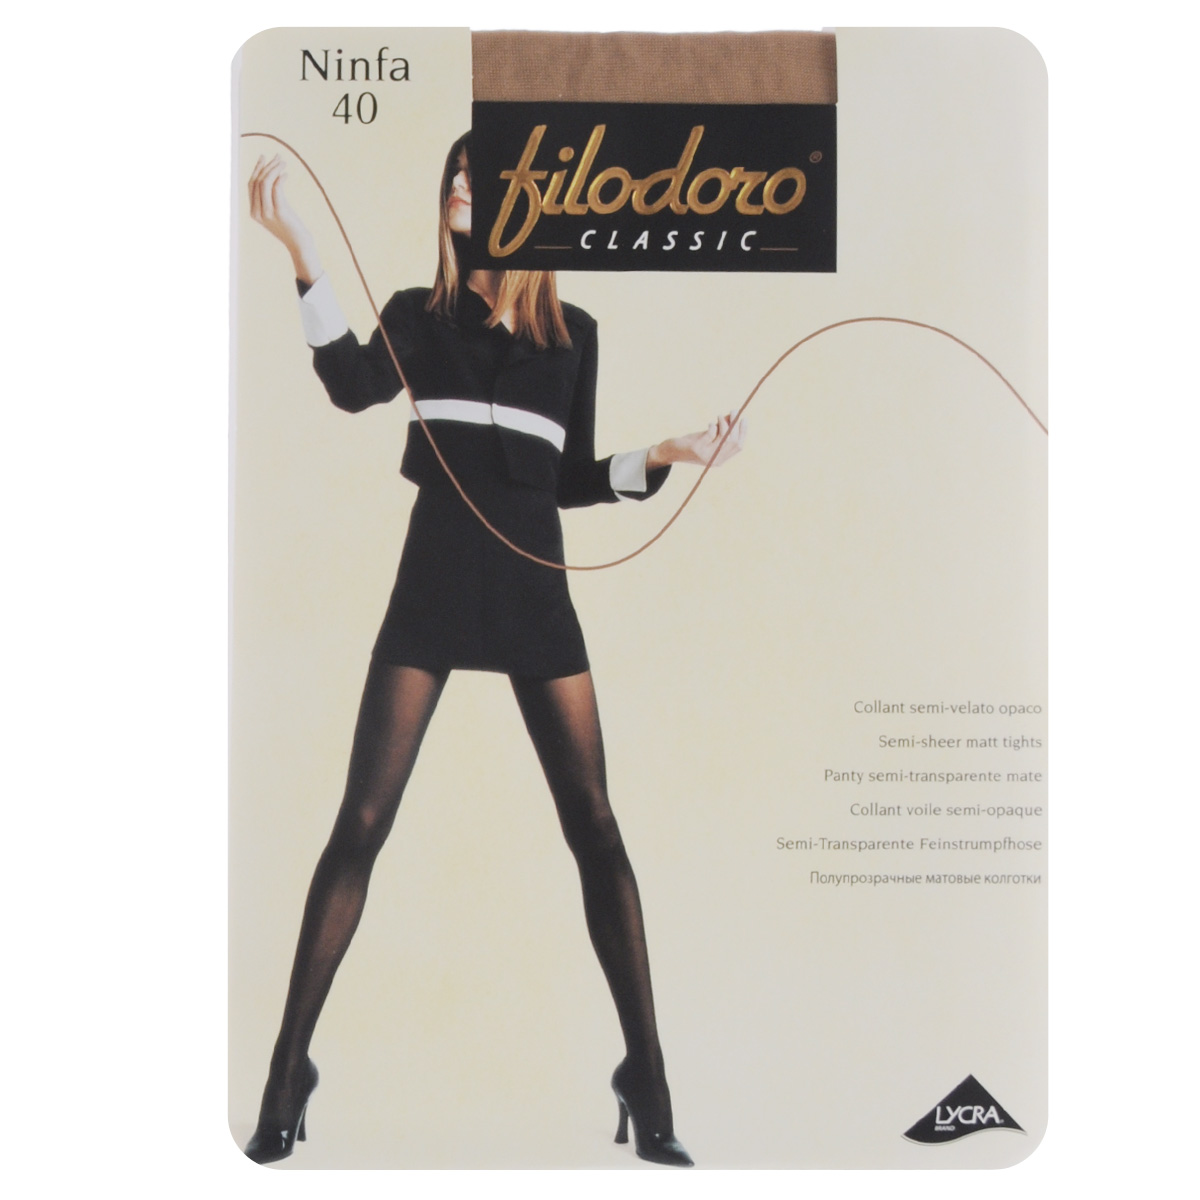 Колготки женские Filodoro Classic Ninfa 40, цвет: Cognac (загар). C115059FC. Размер 5 (Maxi-XL) колготки женские filodoro classic ninfa 20 цвет nero черный c109172fc размер 2 s